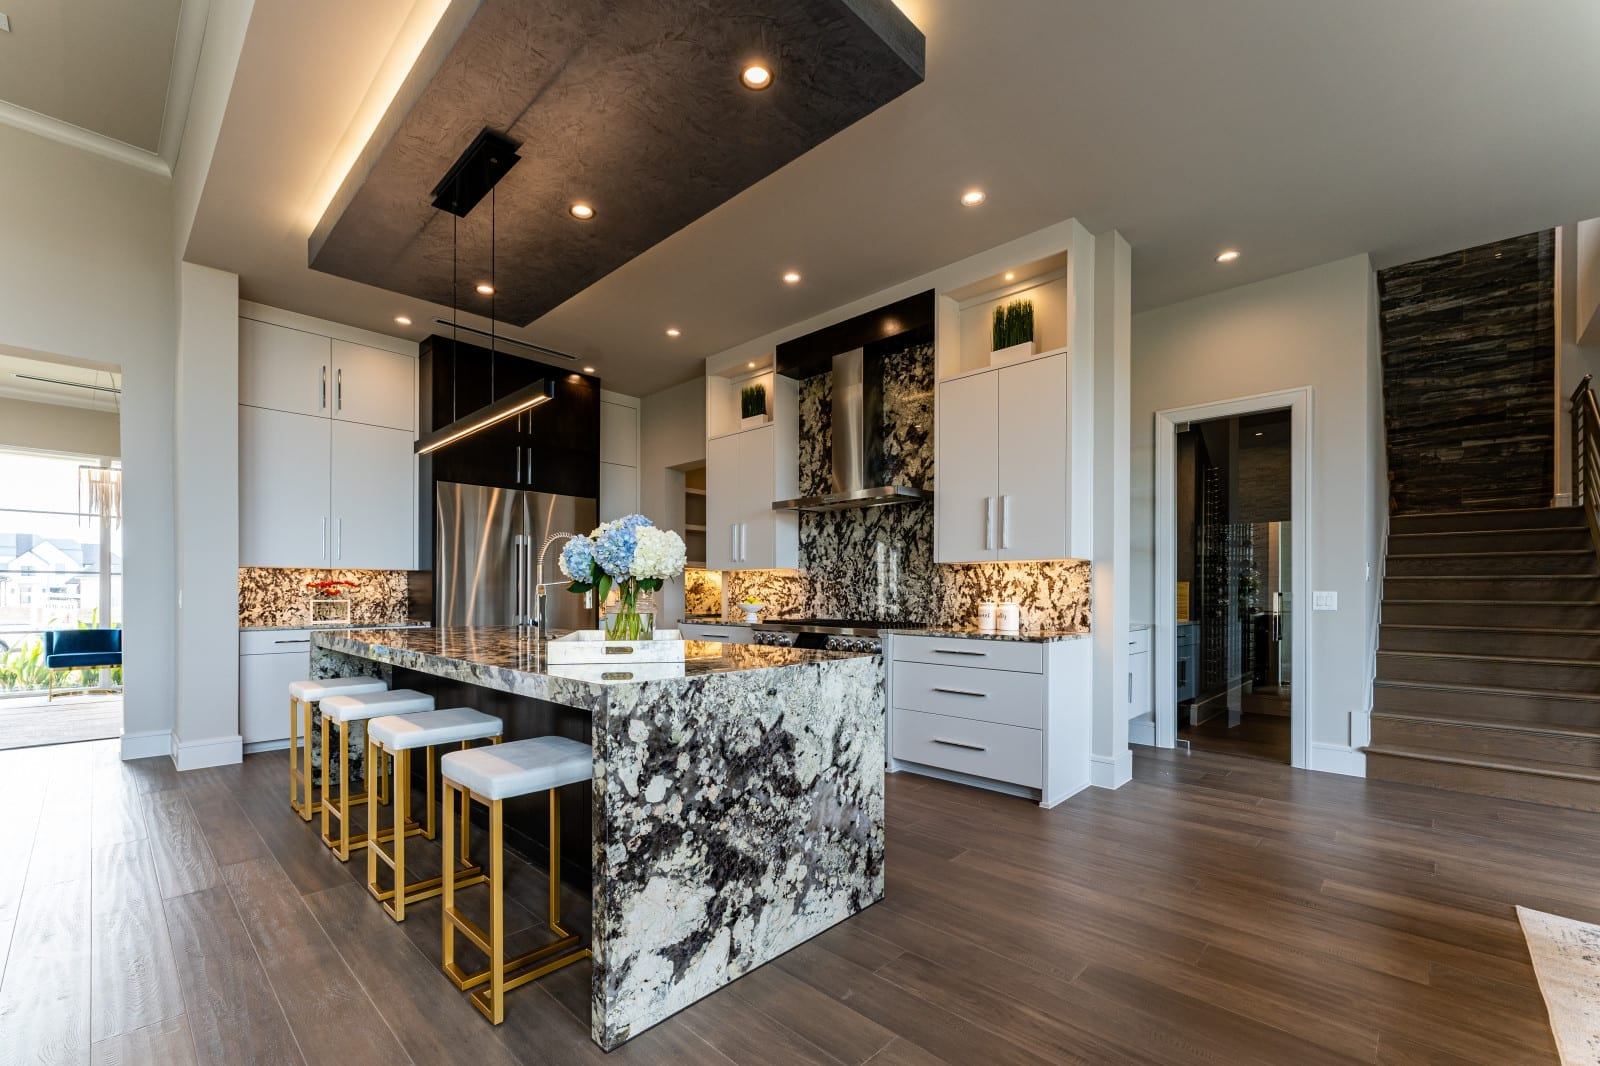 Modern Style Homes design # 12 - Millennial Design + Build